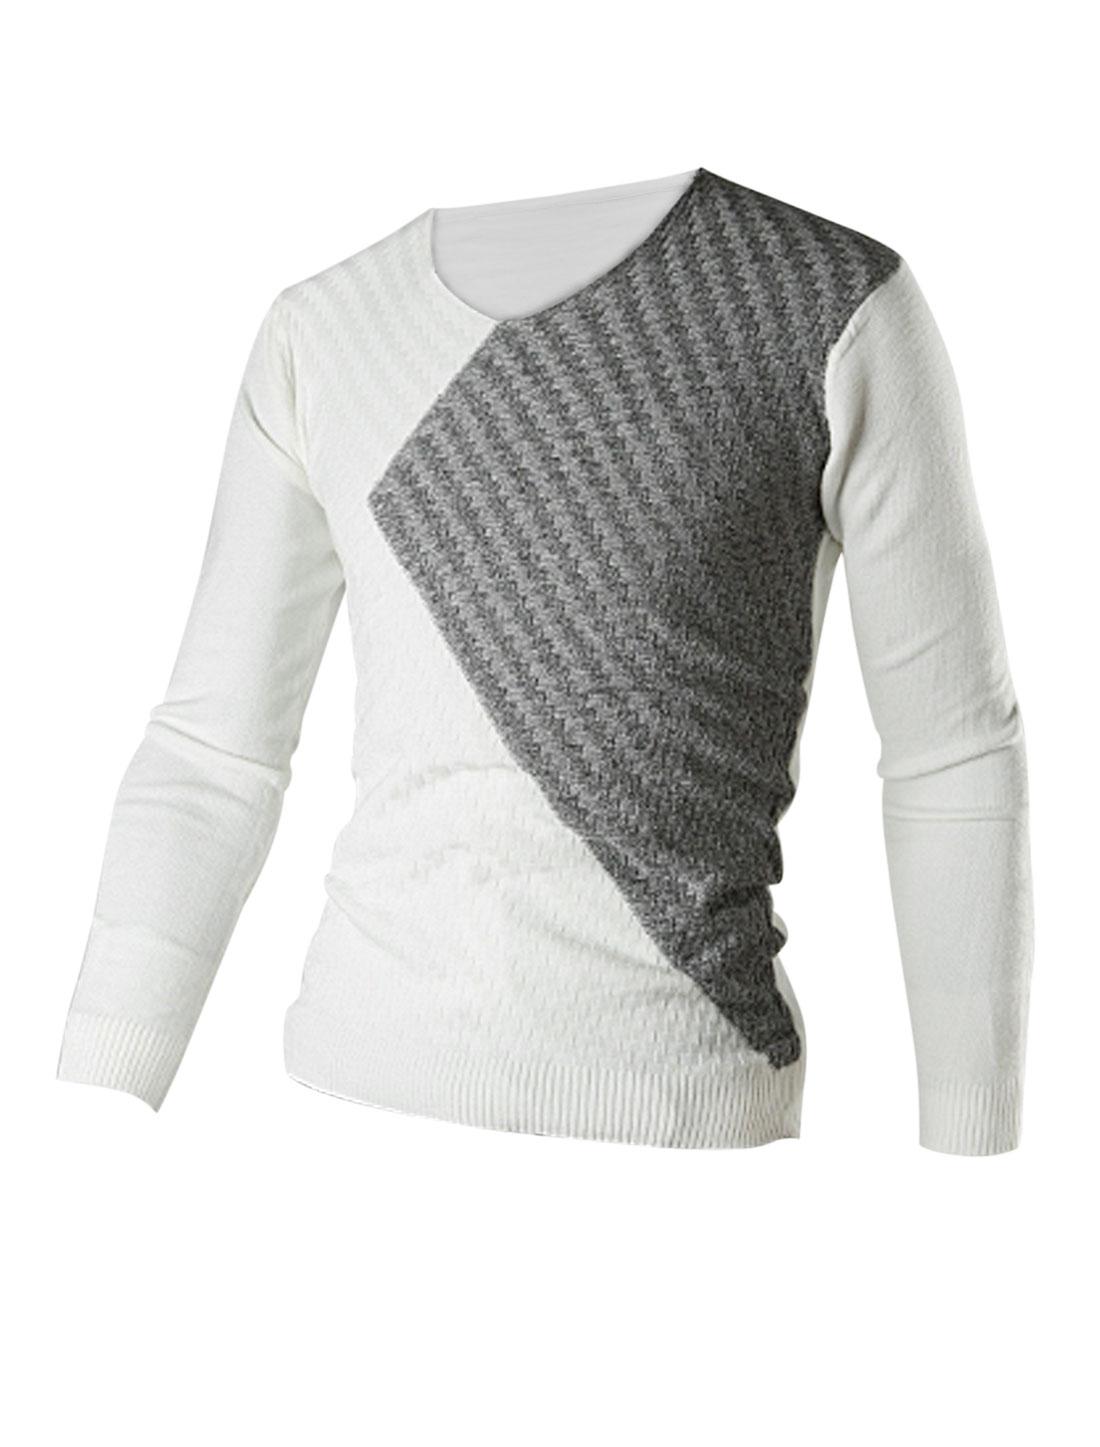 Men V Neck Design Ribbed Cuff w Hem Casual Knit Shirt White Light Gray M